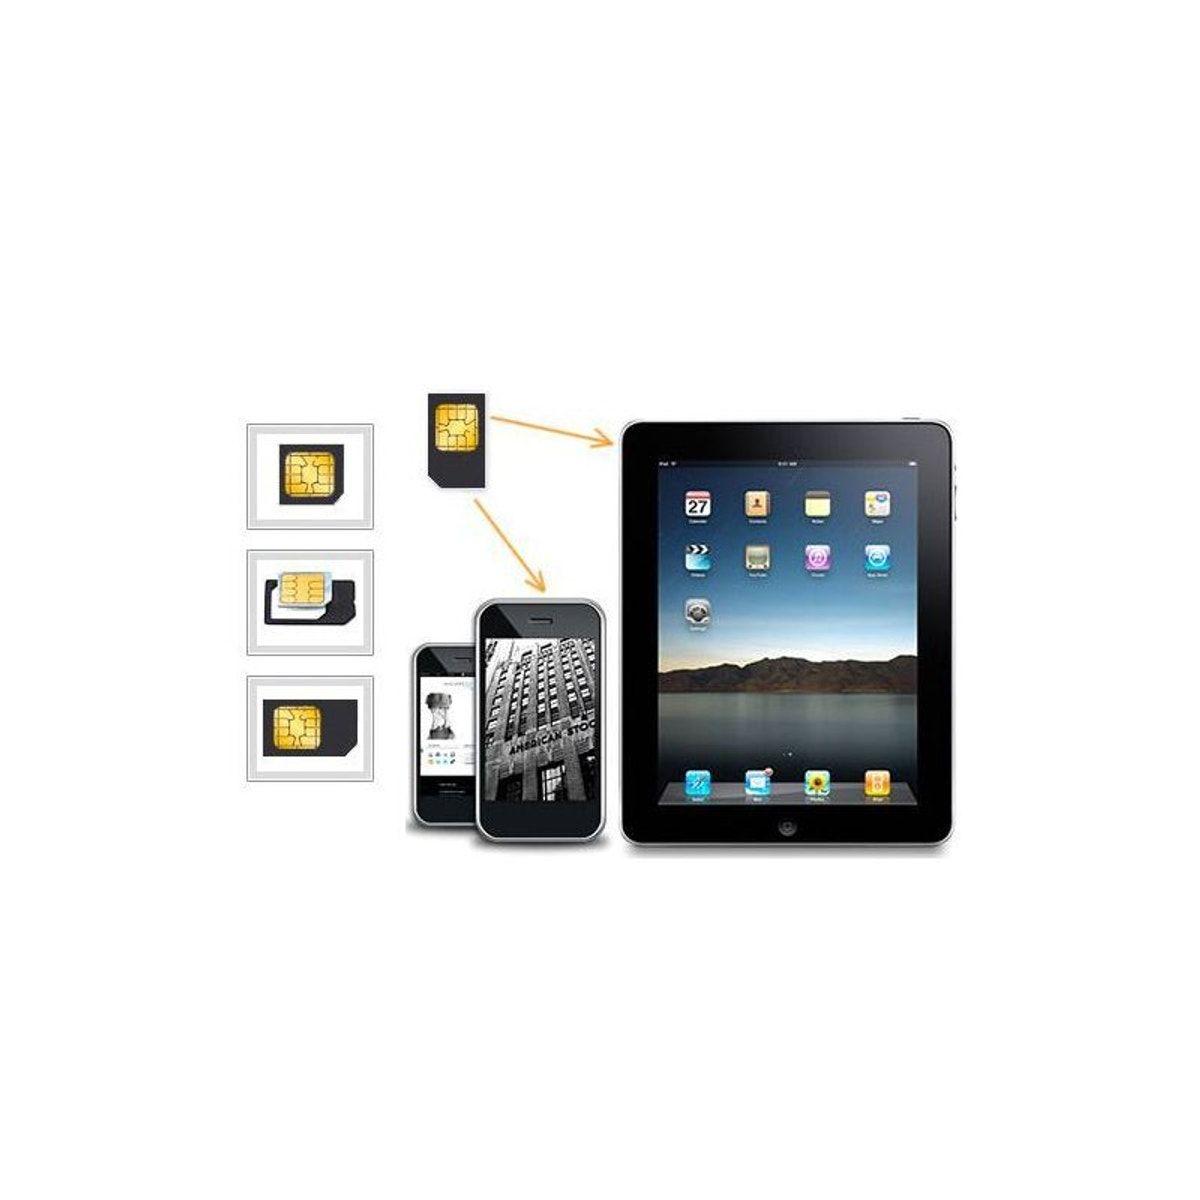 Adaptateur Micro Carte Sim Vers Sim 2 5x1 4 Ipad Et Iphone